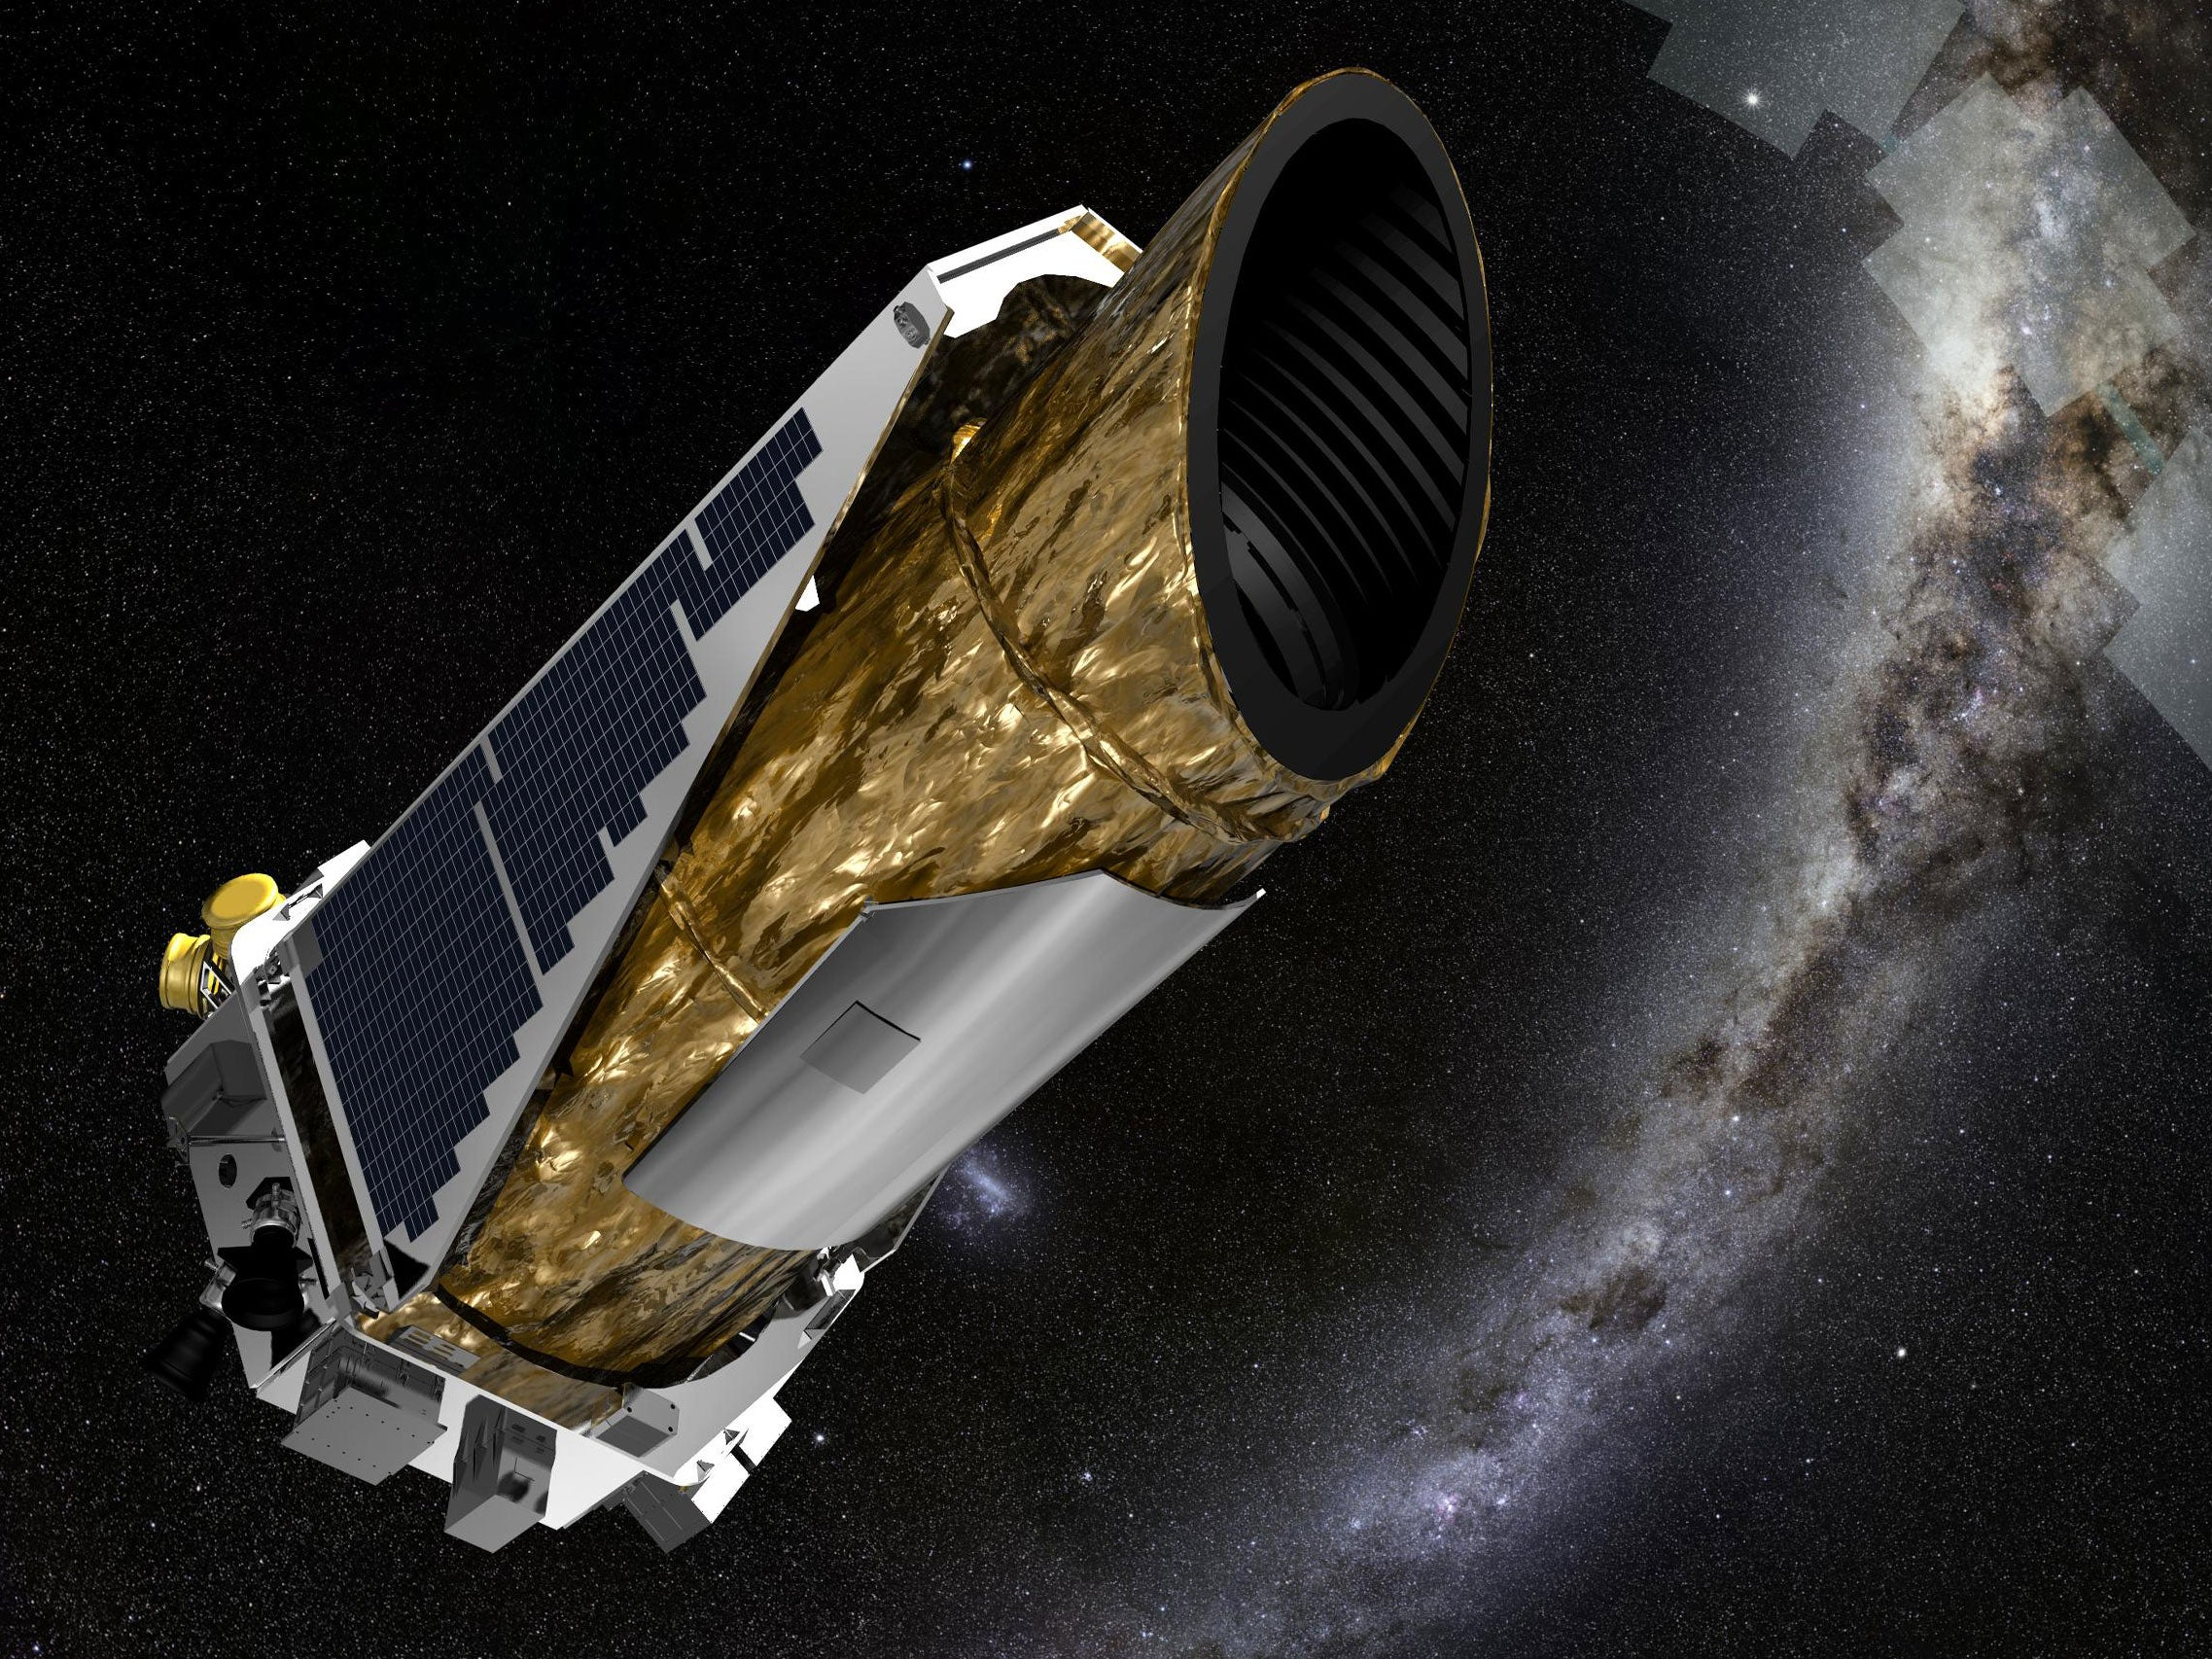 kepler spacecraft telescope - HD1368×1026